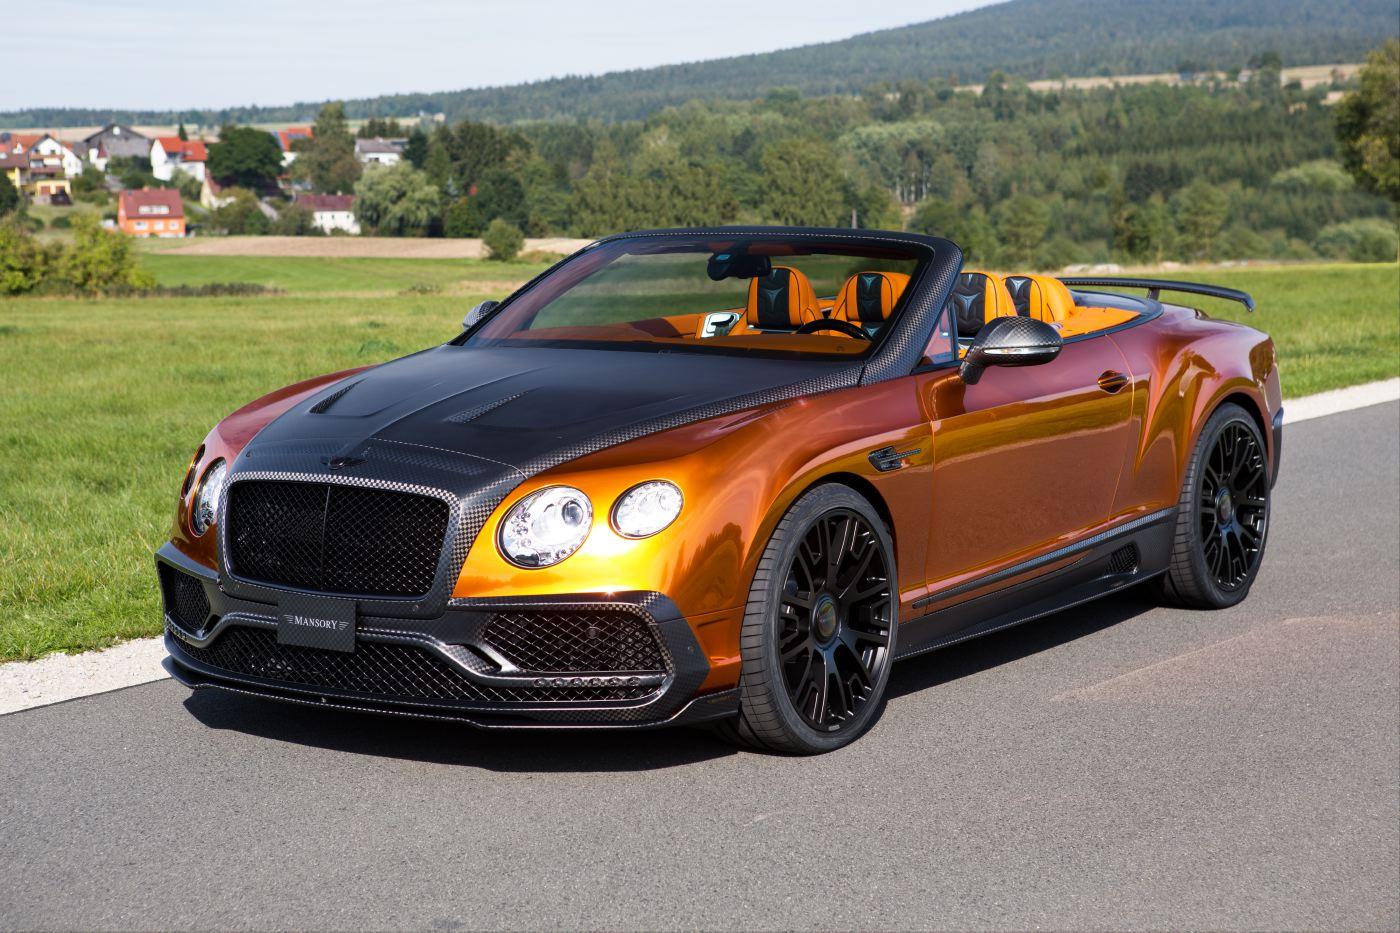 Elegantes Mansory Veredelungsprogramm F 252 R Den Bentley Gtc